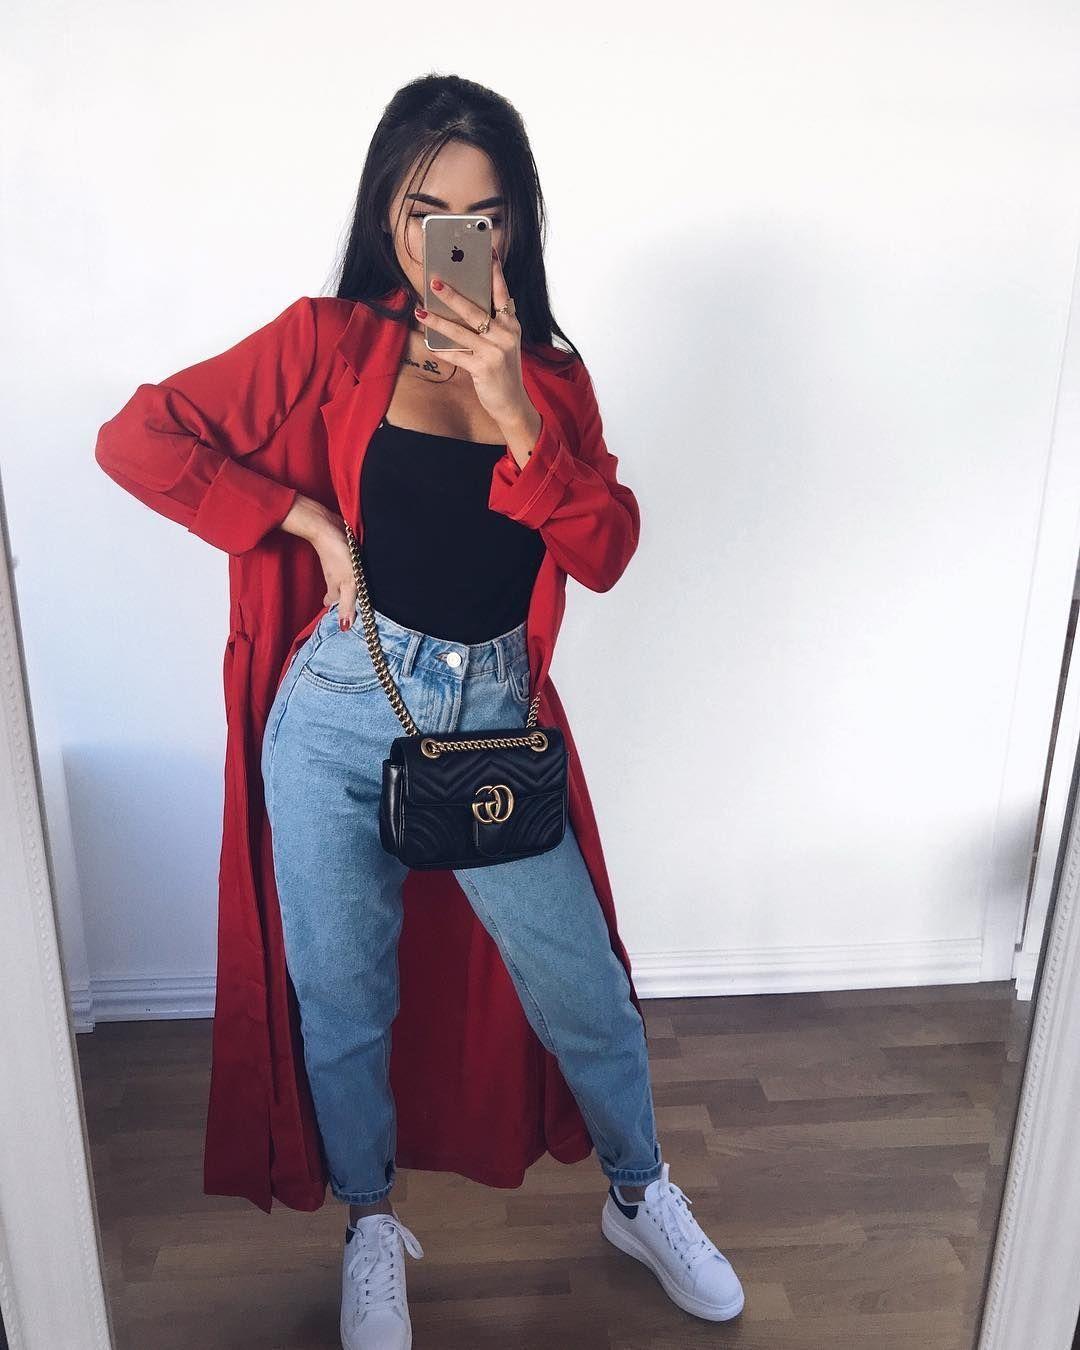 Pin De Moda Y Maquillaje En Outfit Ideas Ropa Outfits Ropa De Moda